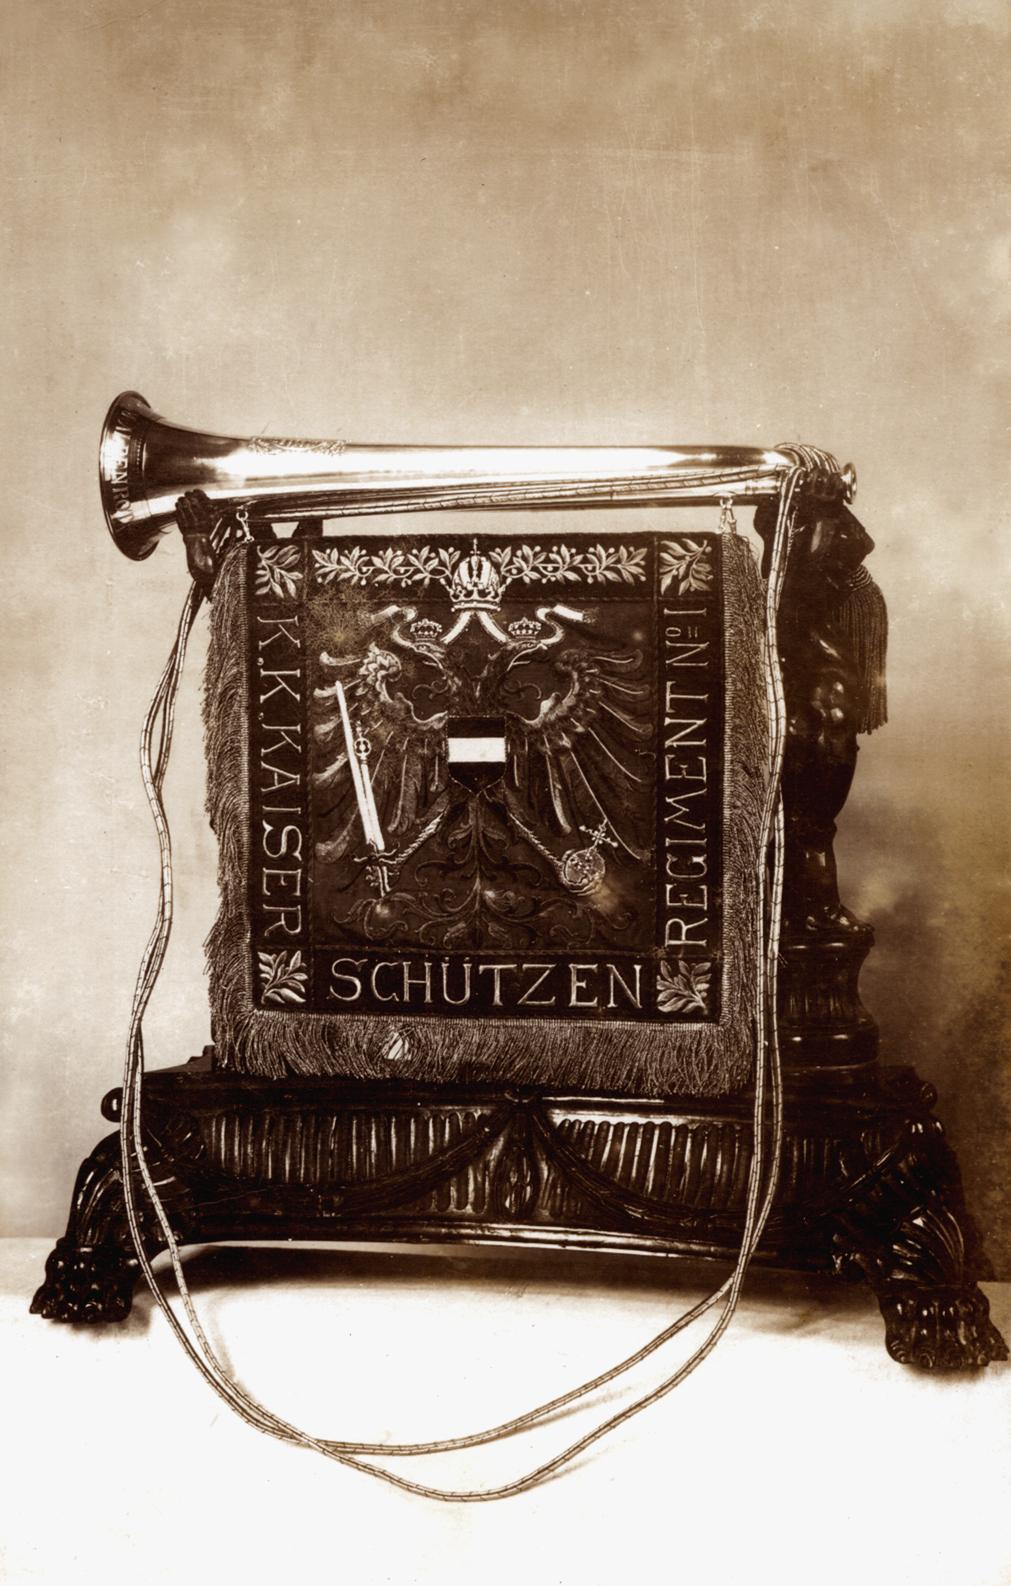 09 - Gagliardetto dei Kaiserschützen.jpg